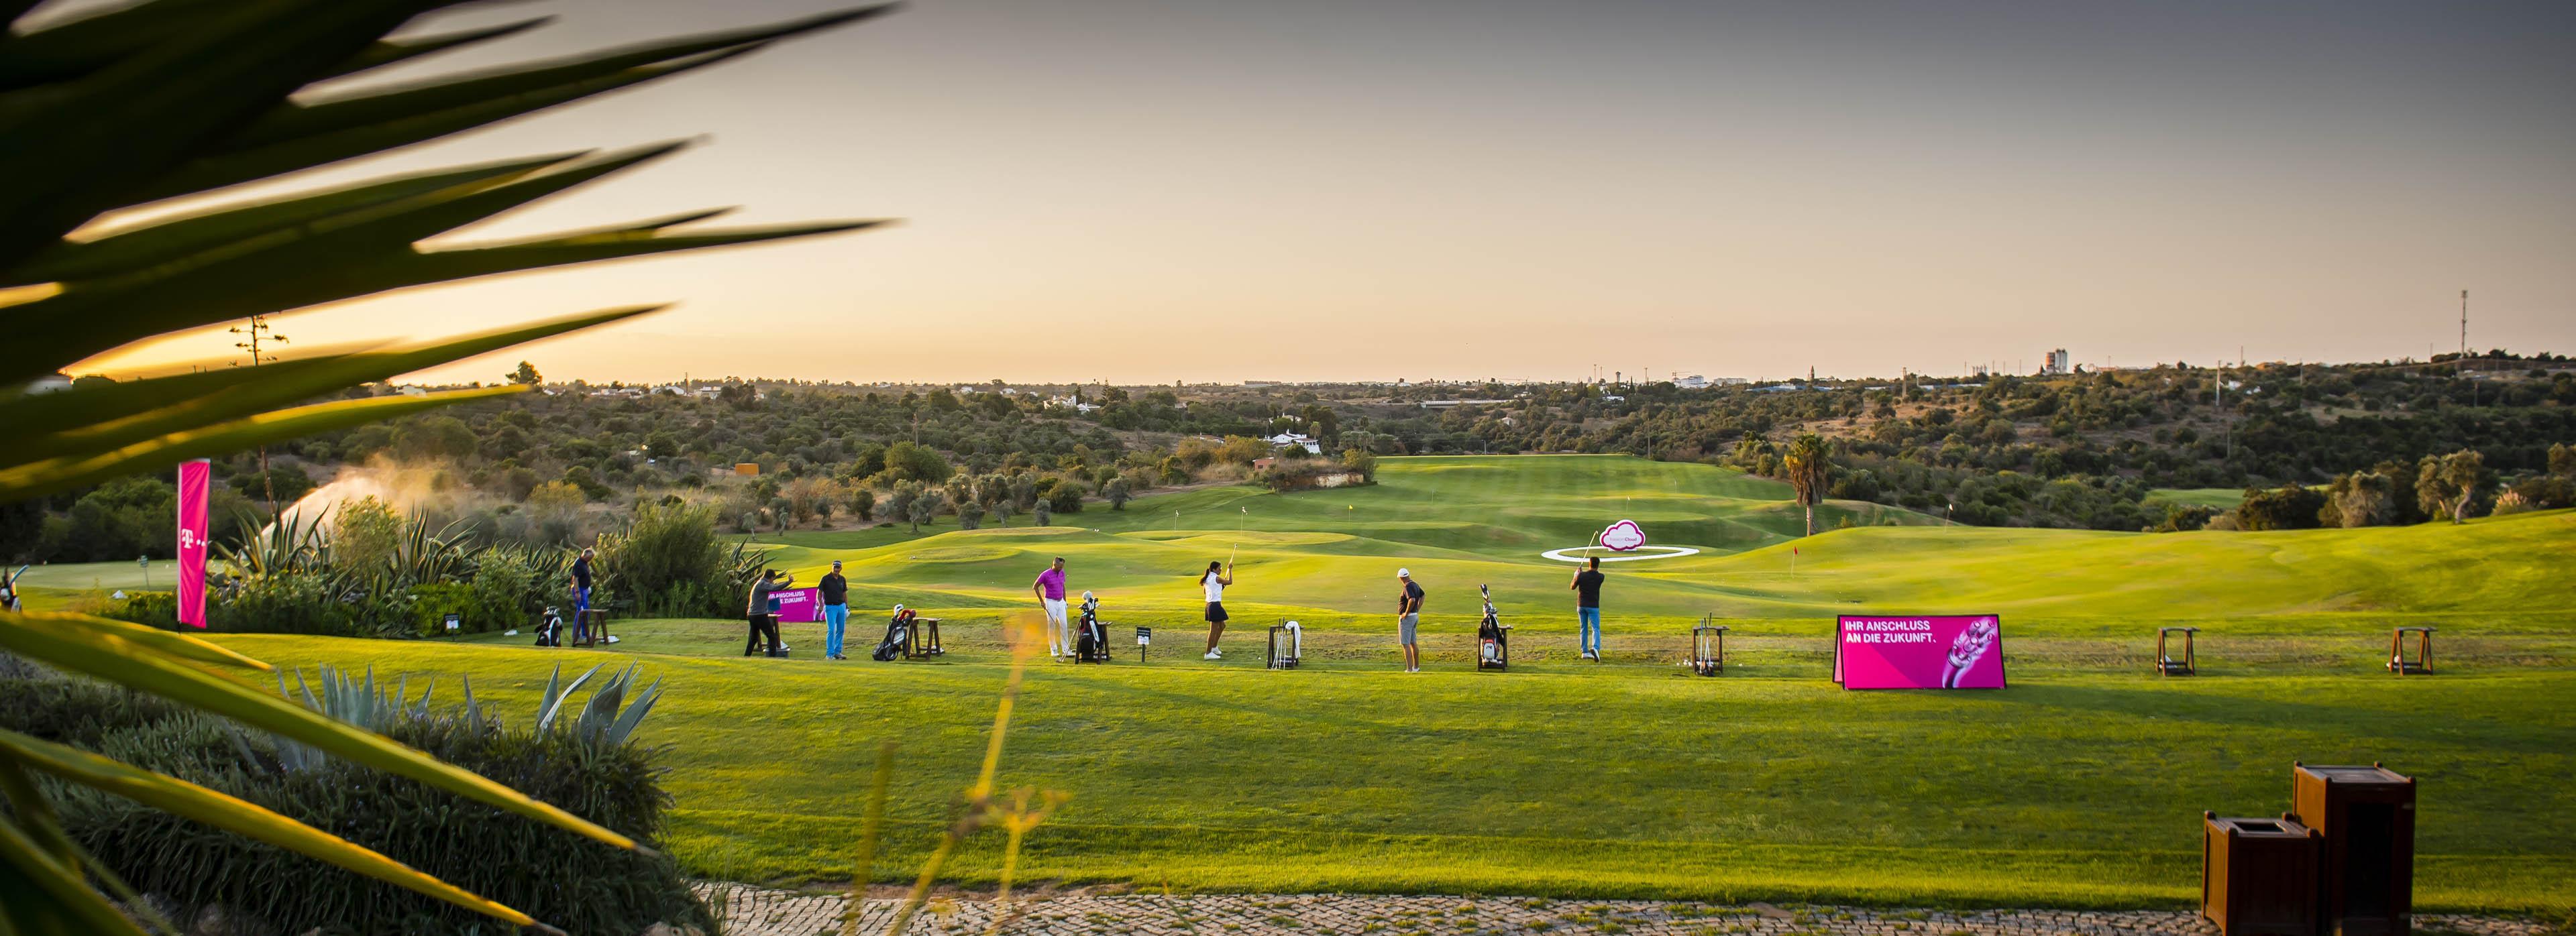 RFH-6297-golf